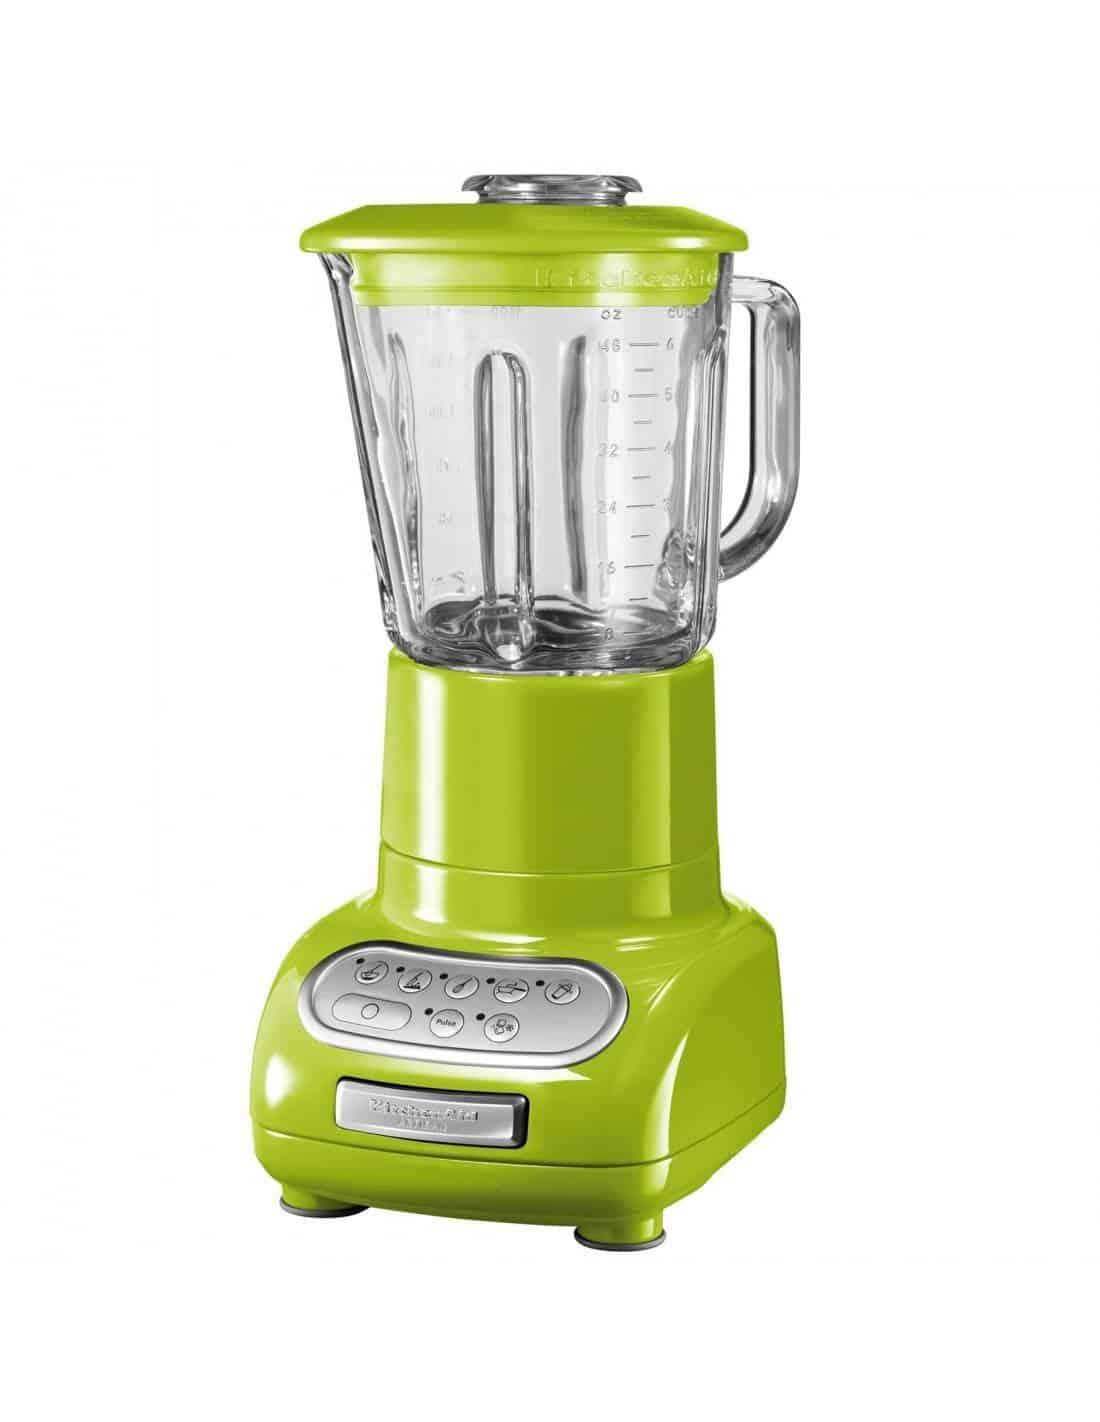 Kitchenaid Artisan Green Apple Blender Mimocook Online